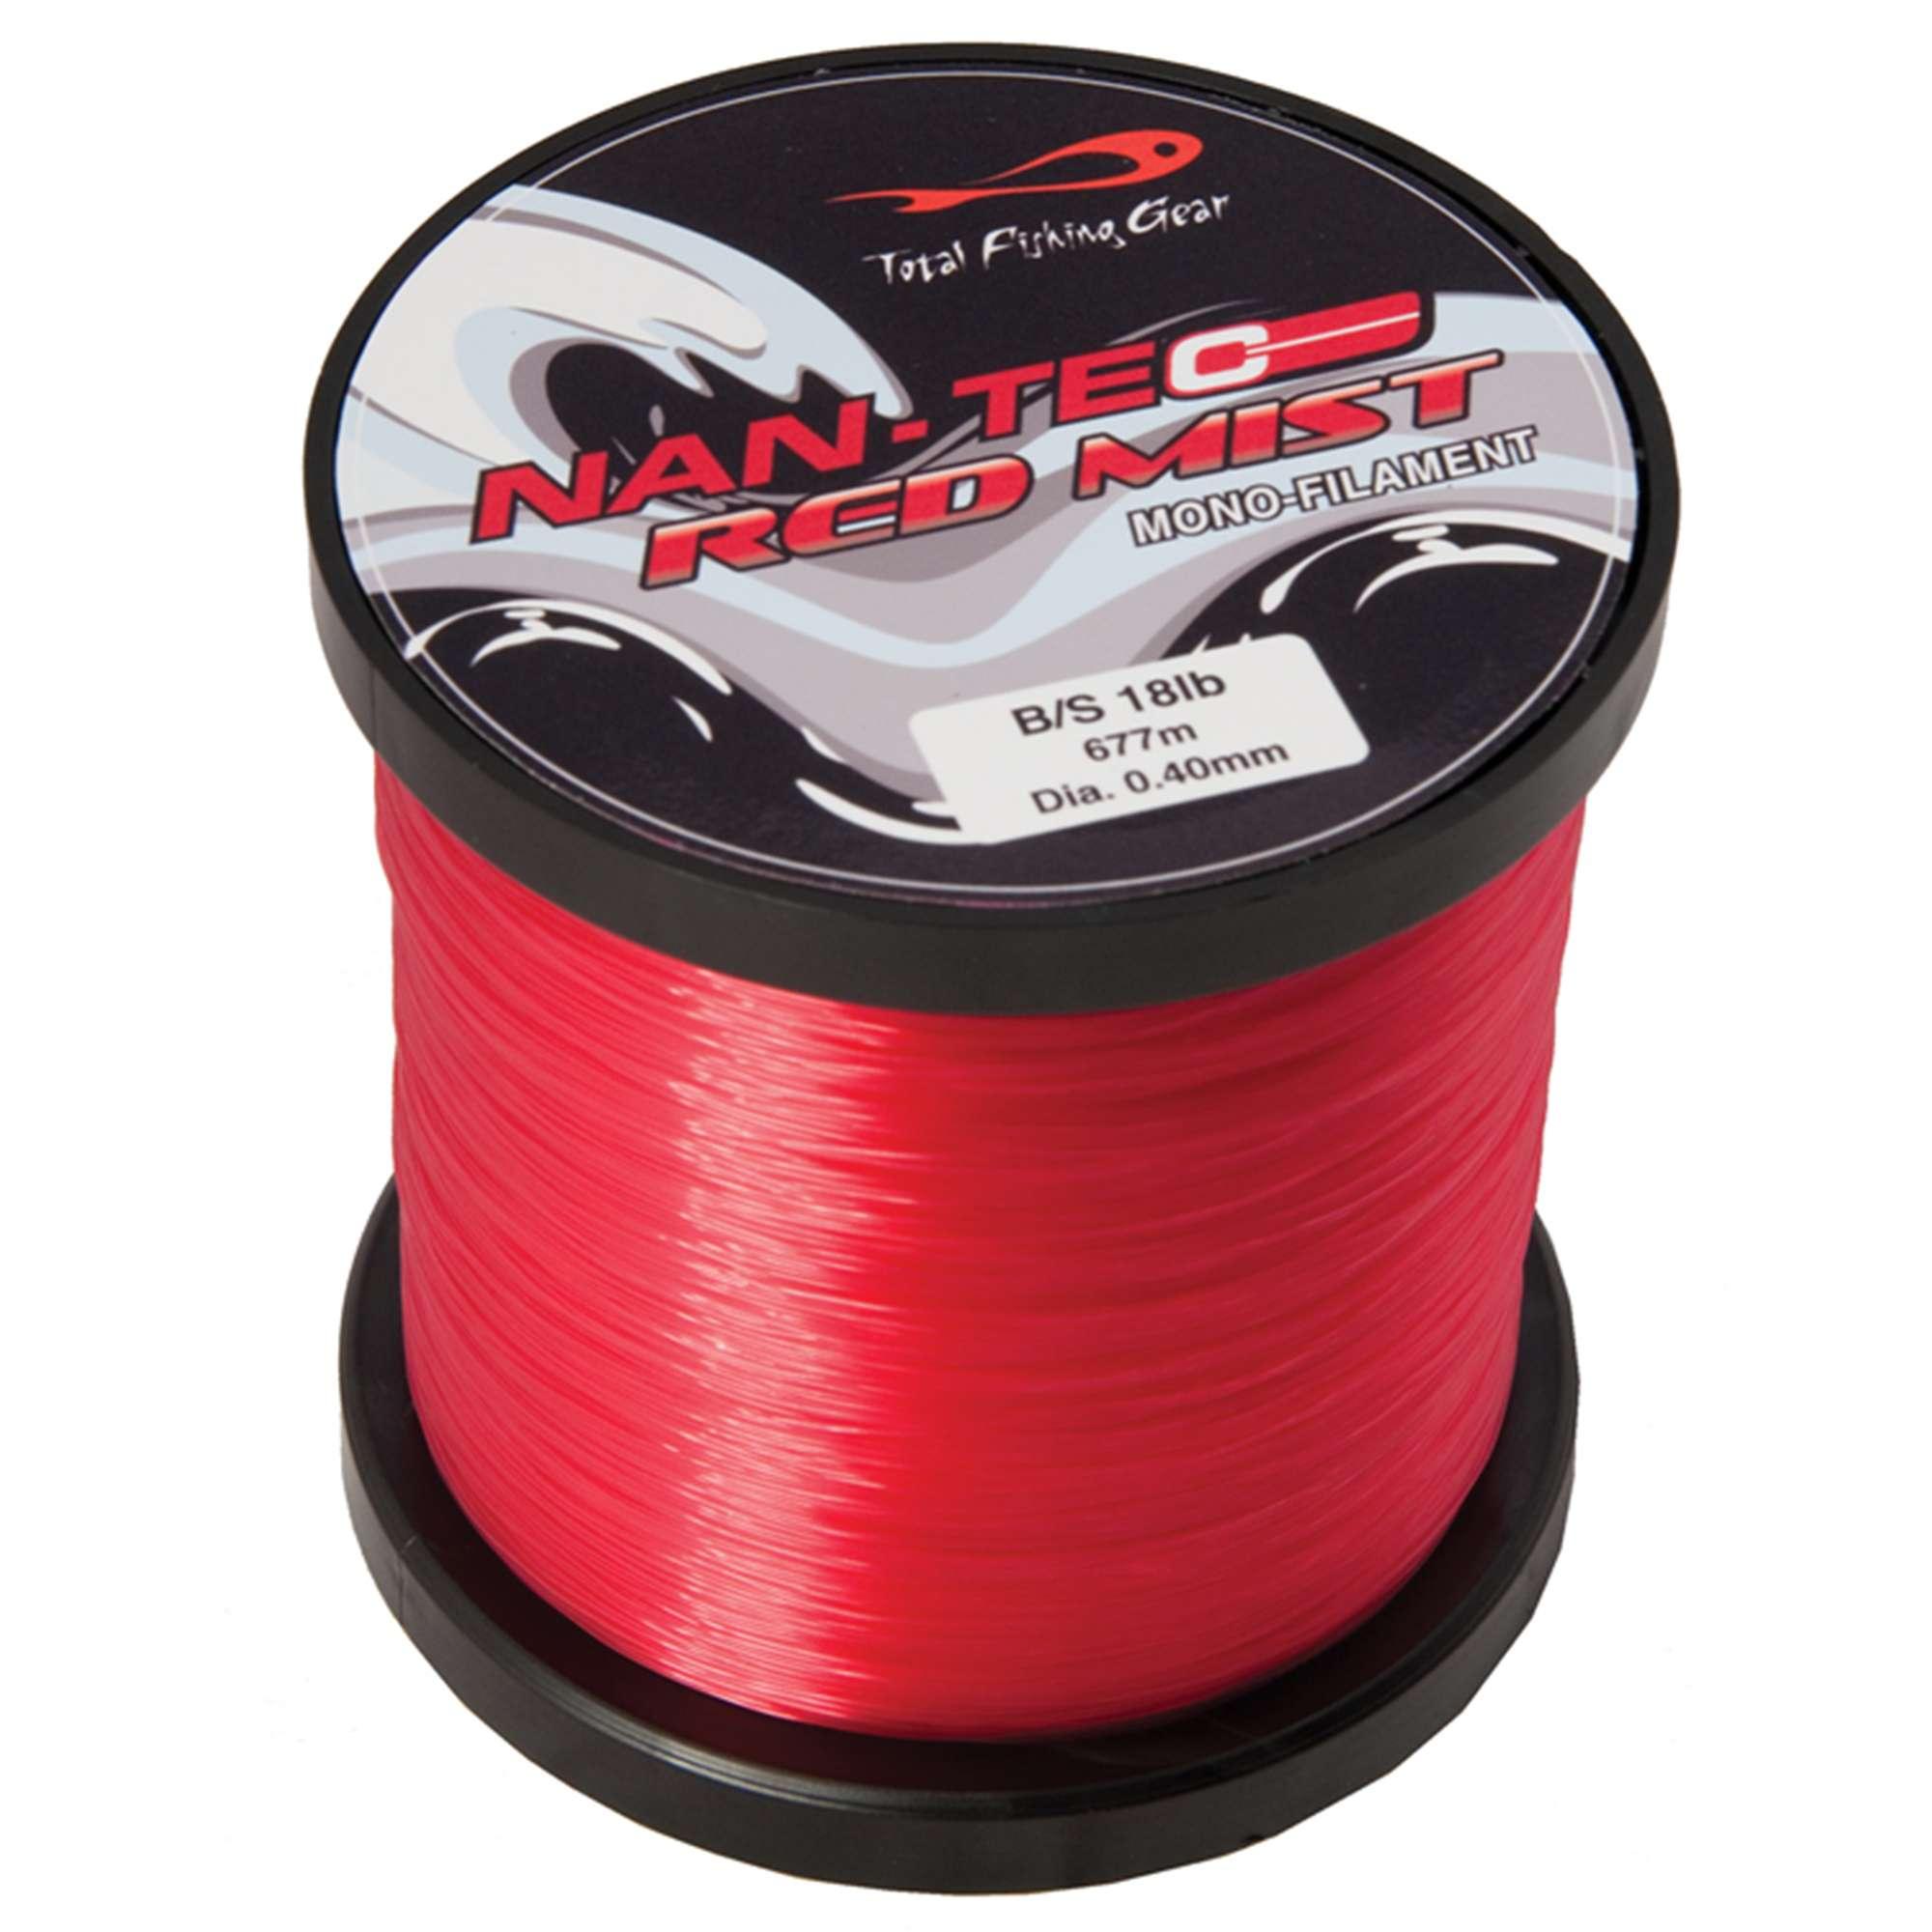 TFG Nan-Tec Red Mist Mono Filament Line 30lb